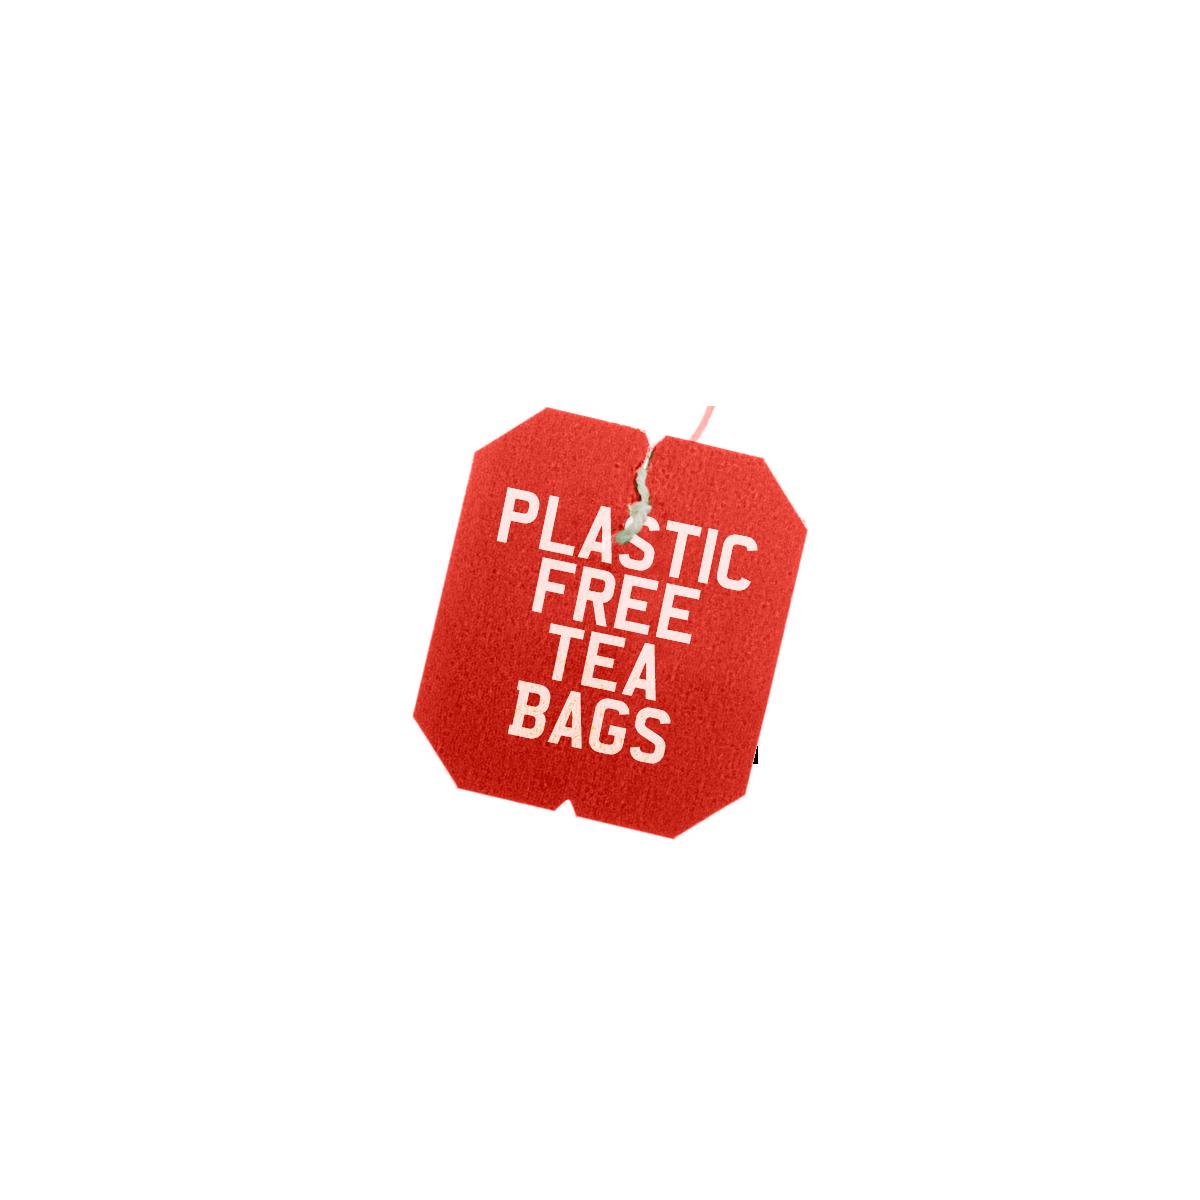 Plastic Free Tea Bags - Alan Dunn & Port Sunlight